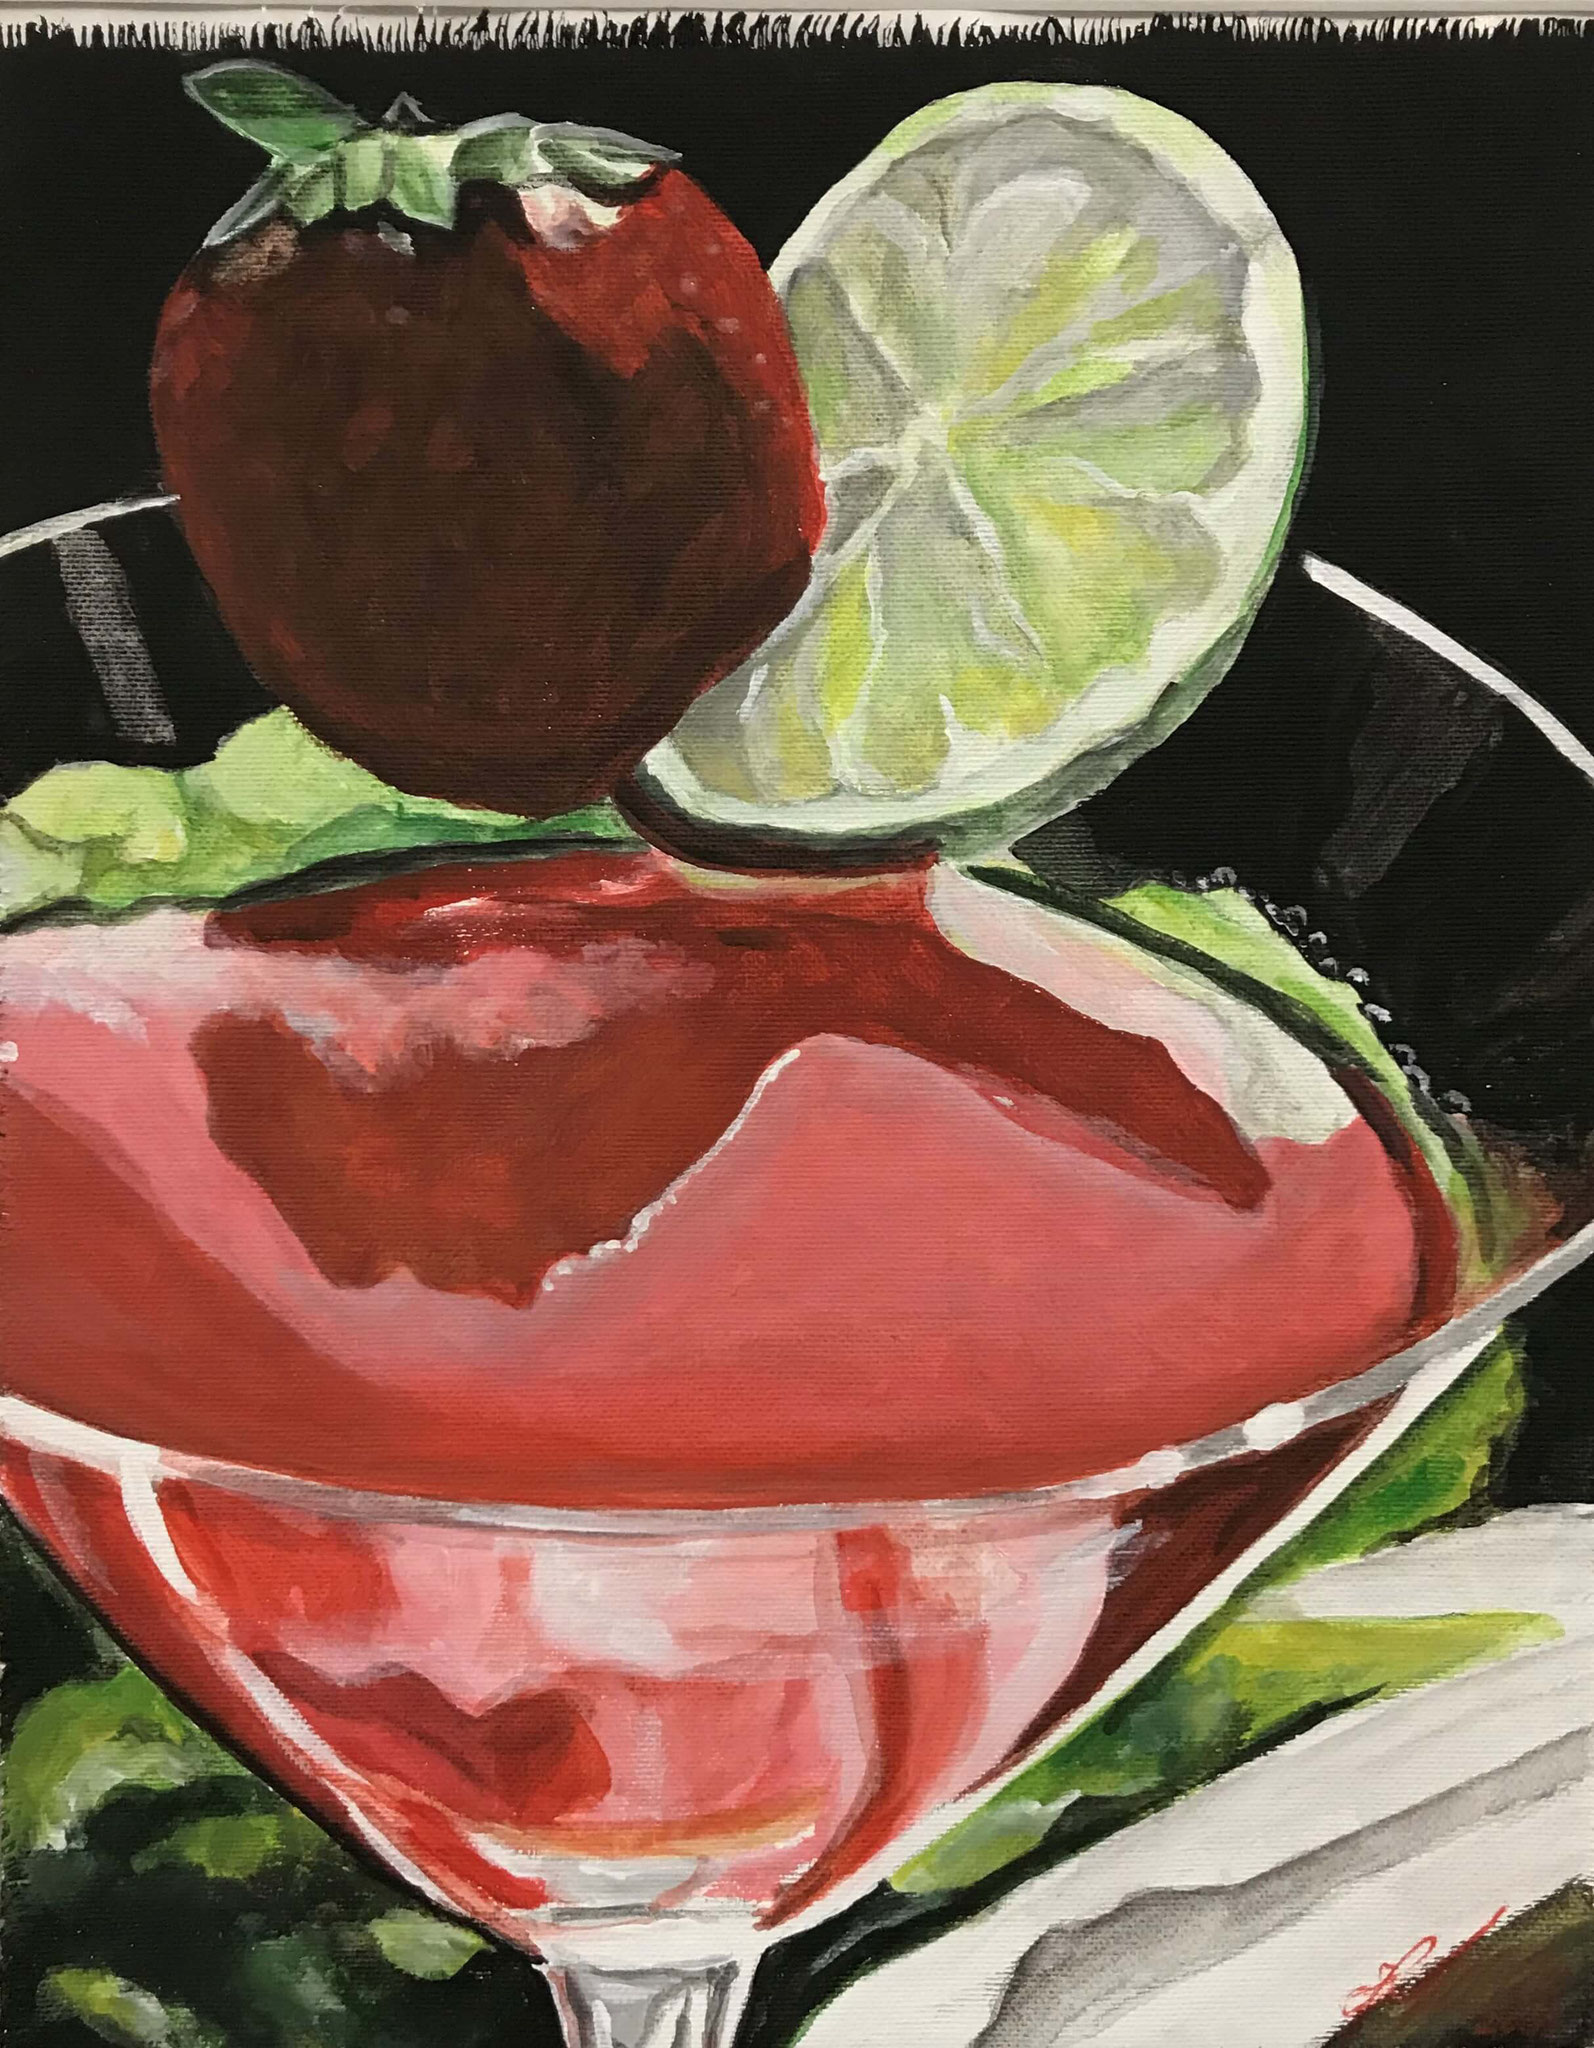 "Fr. 420.00 ""Erdbeer Cocktail"" Acryl auf Leinwand 40 x 50 cm."